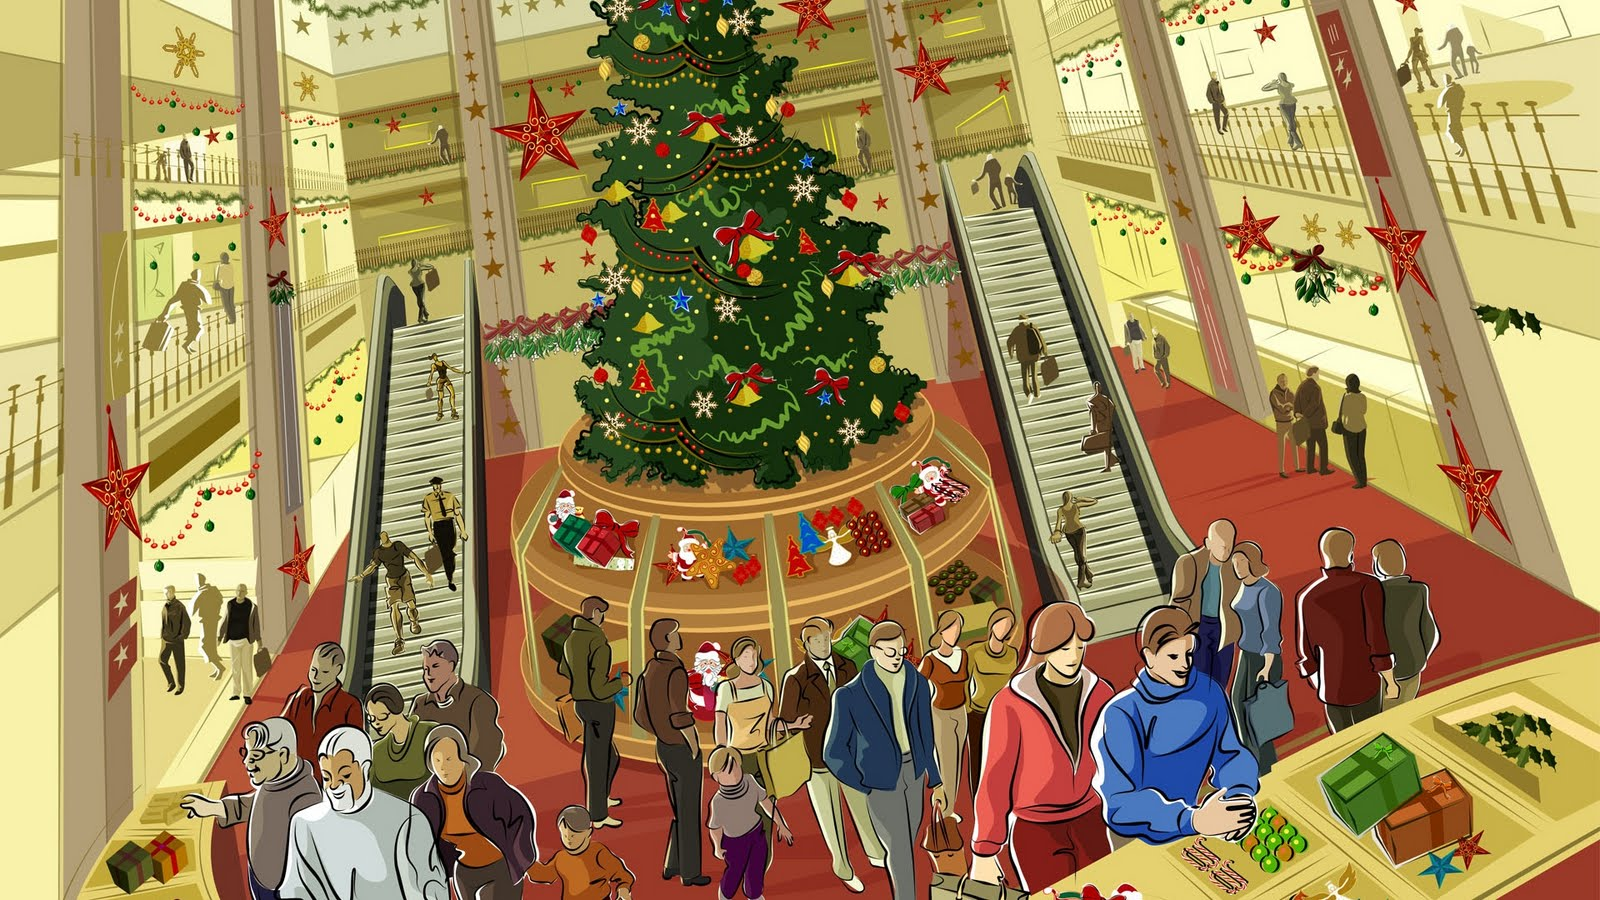 Free 2011 christmas greeting cards free christmas wallpapers e cards free 2011 christmas greeting cards free christmas wallpapers e cards online kristyandbryce Gallery